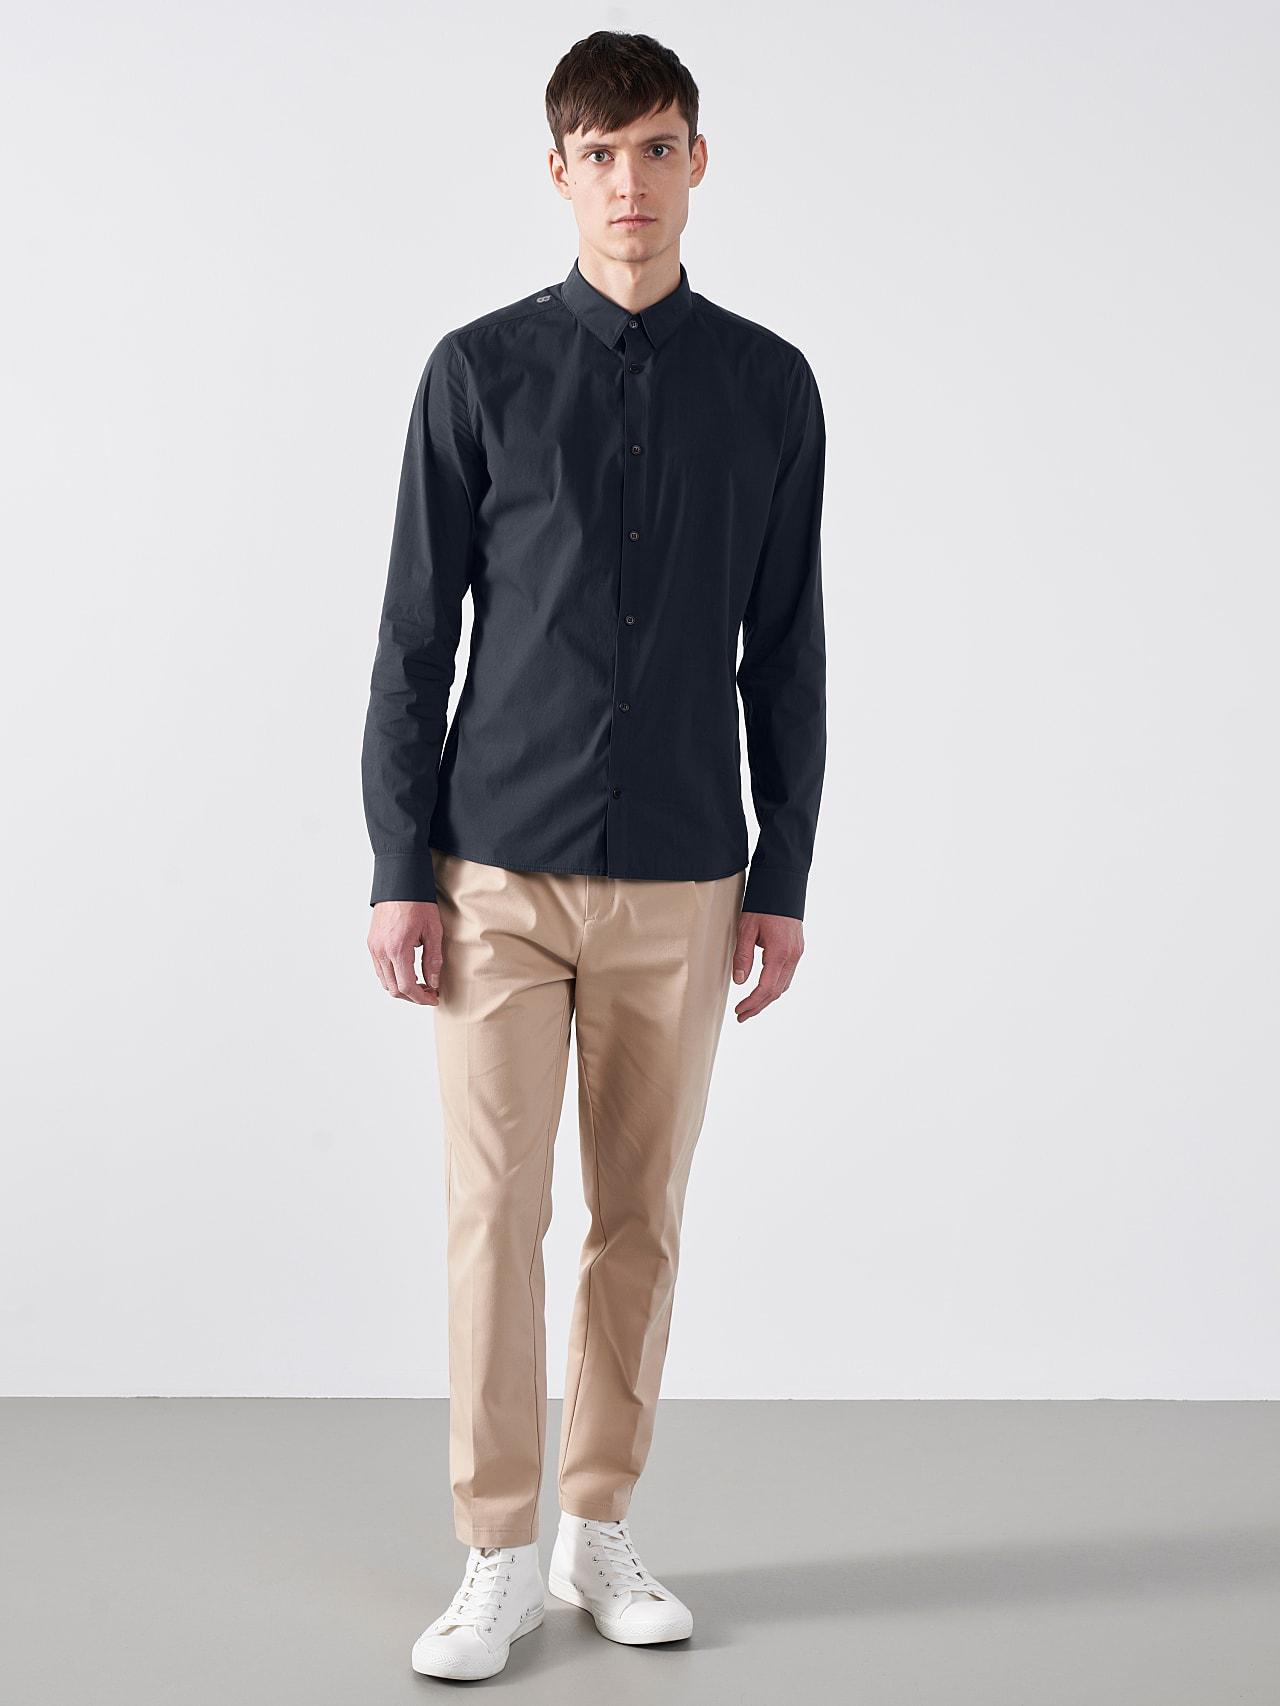 WAARG V1.Y5.01 Cotton-Stretch Shirt navy Front Alpha Tauri